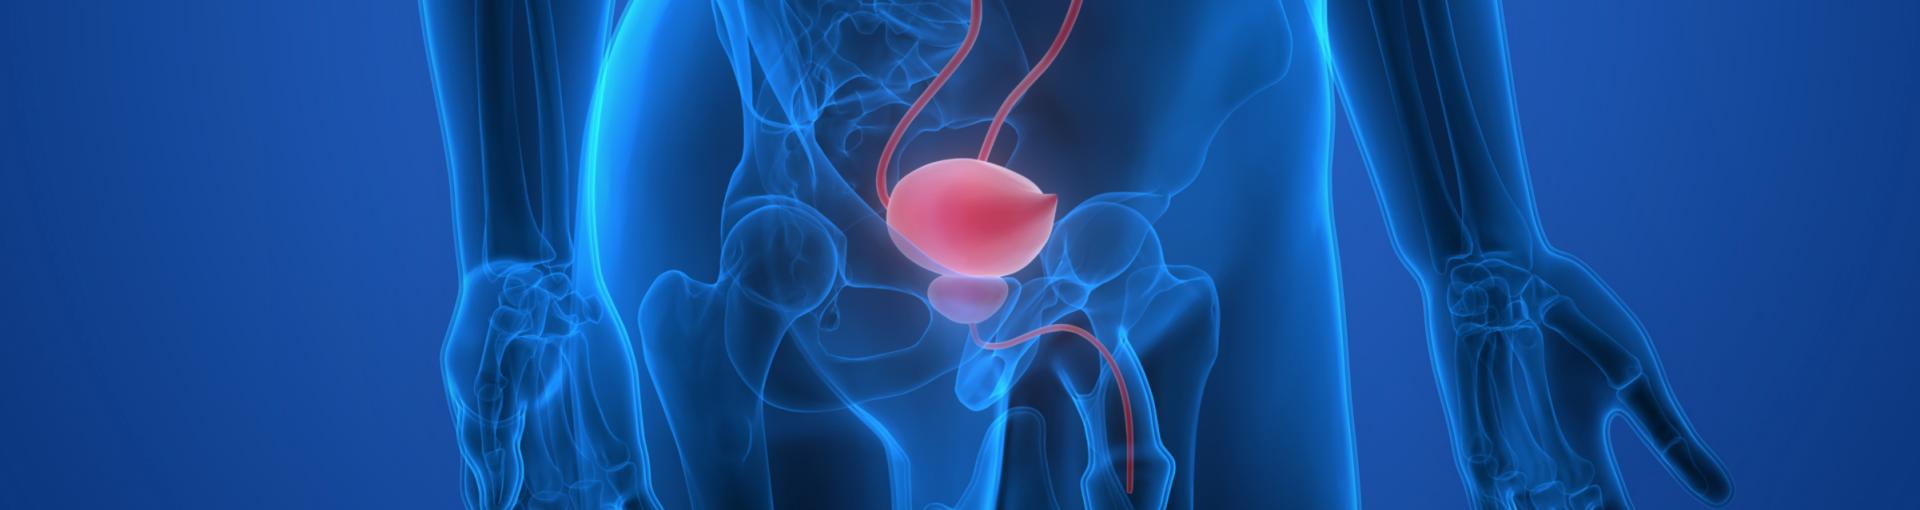 prostate